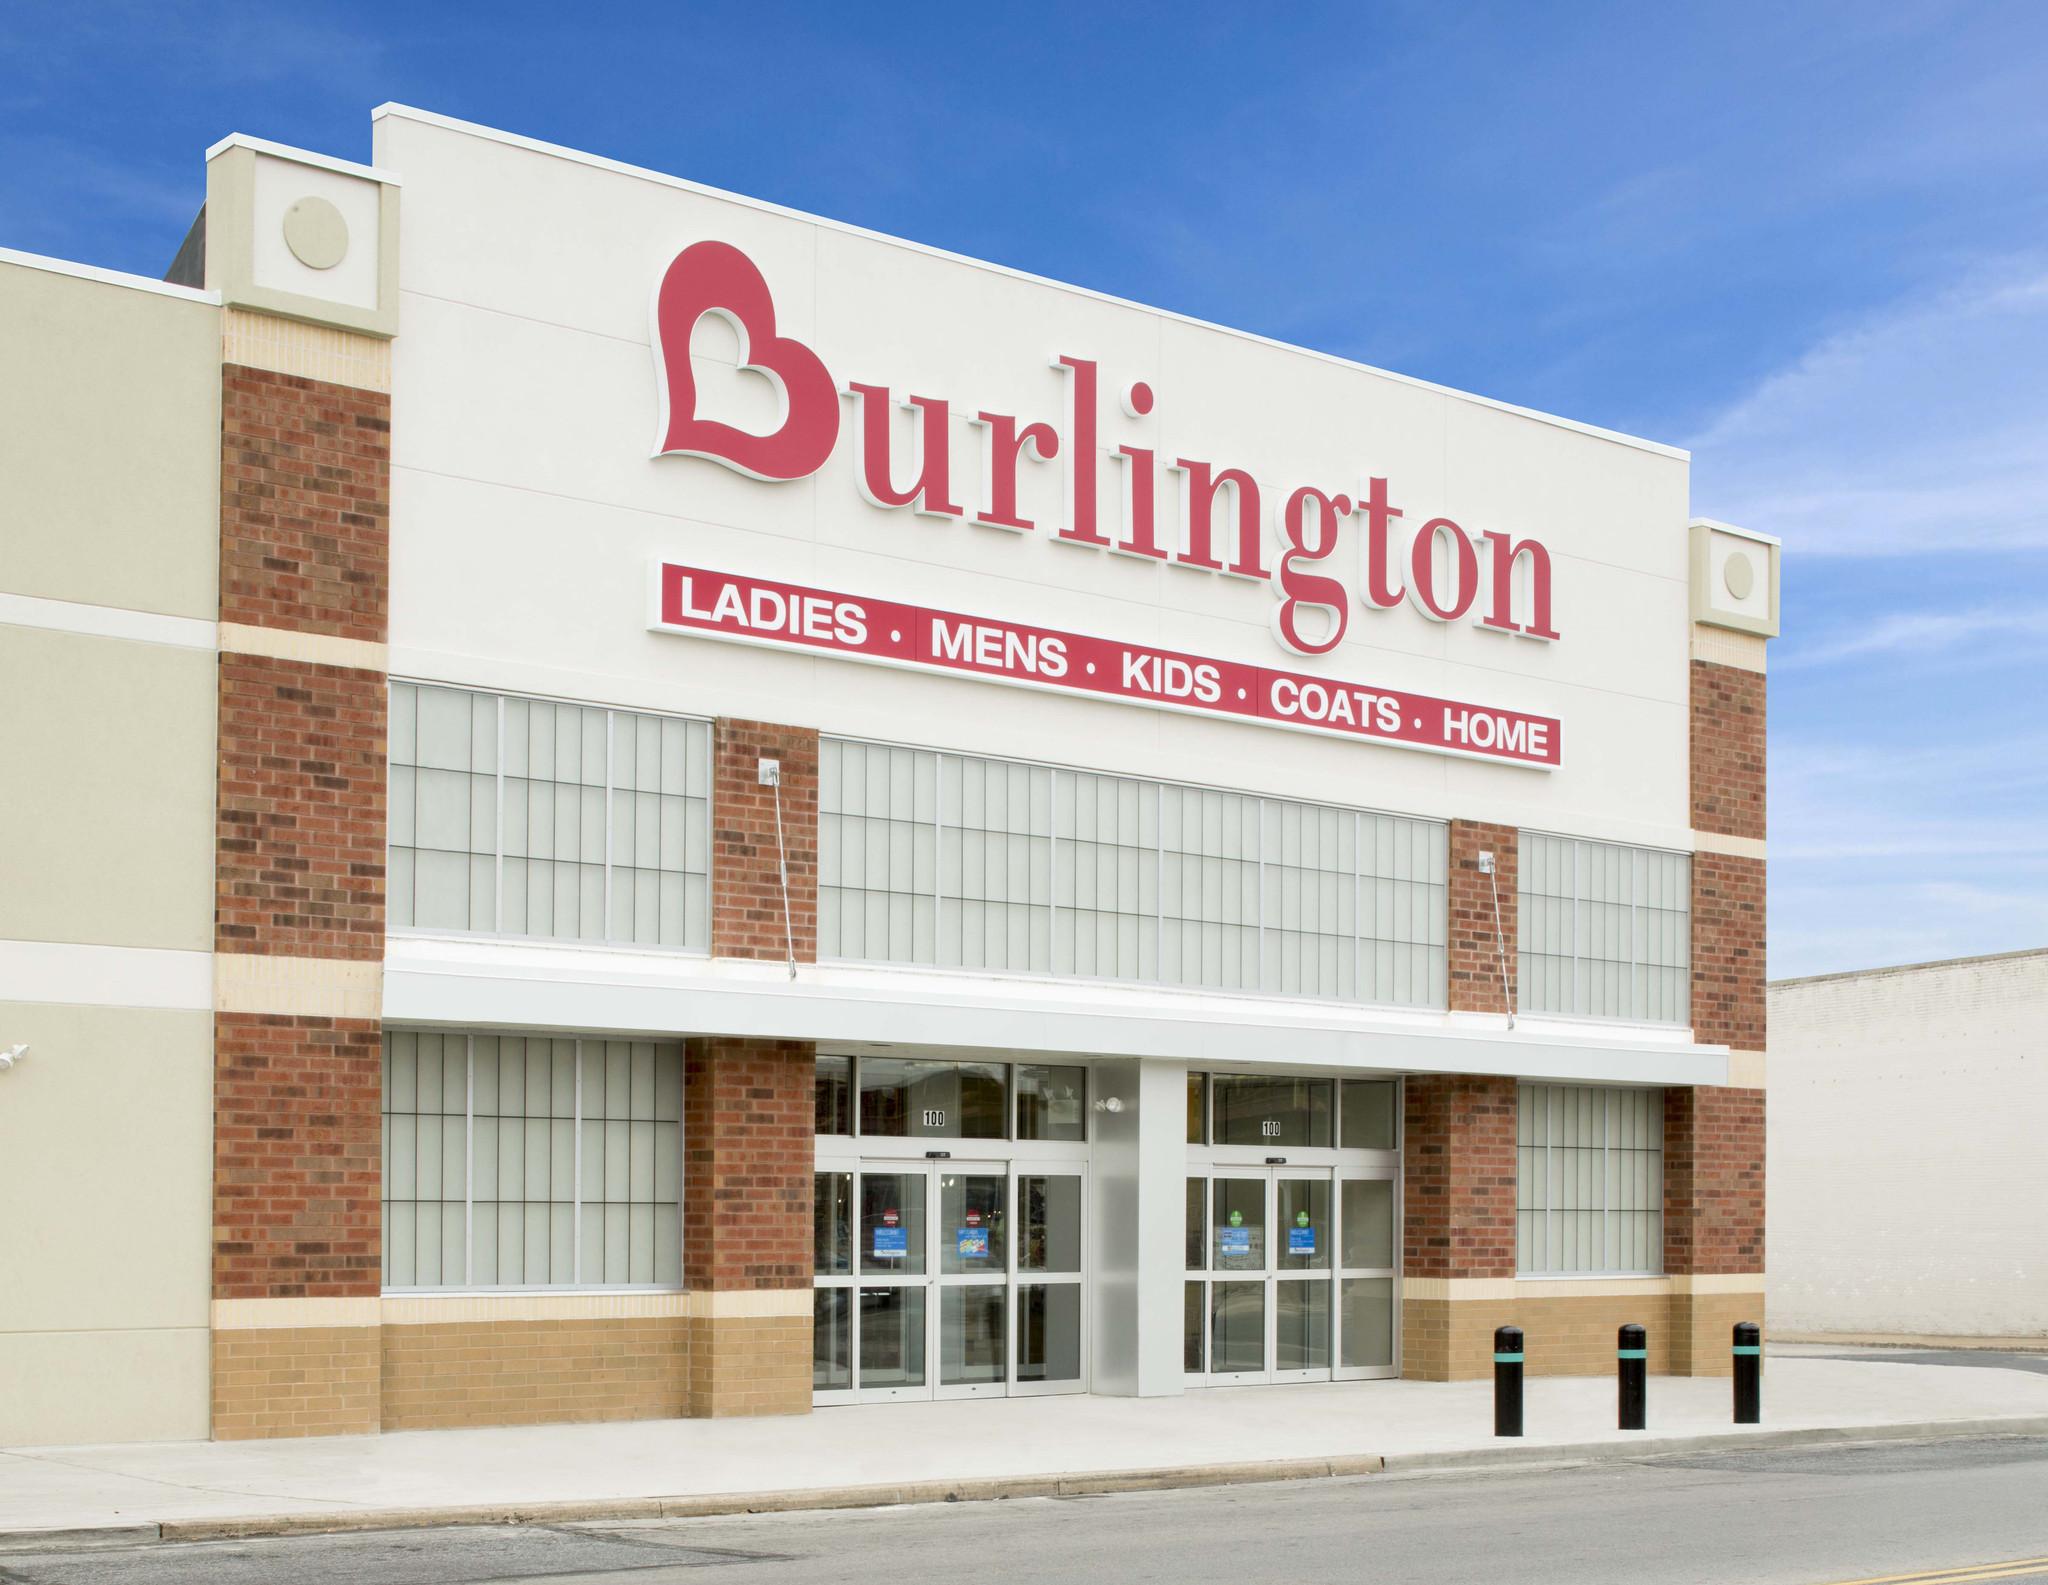 fl-burlington-hollywood-20150514 Hollywood Burlington to open in March; job fair set for Jan. 14-15